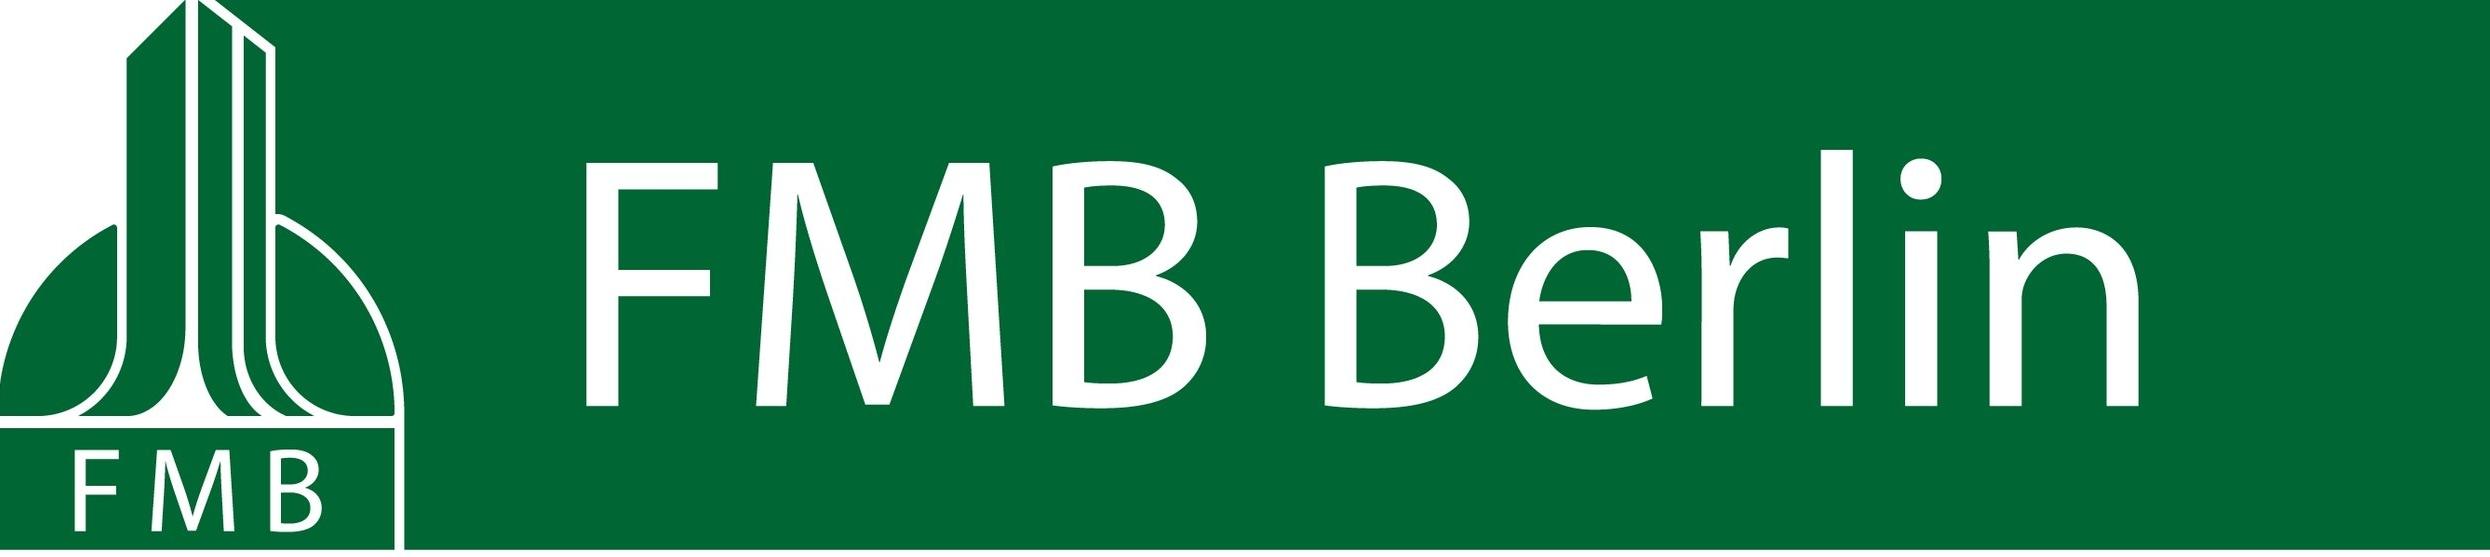 FMB Logo_JPEG.JPG